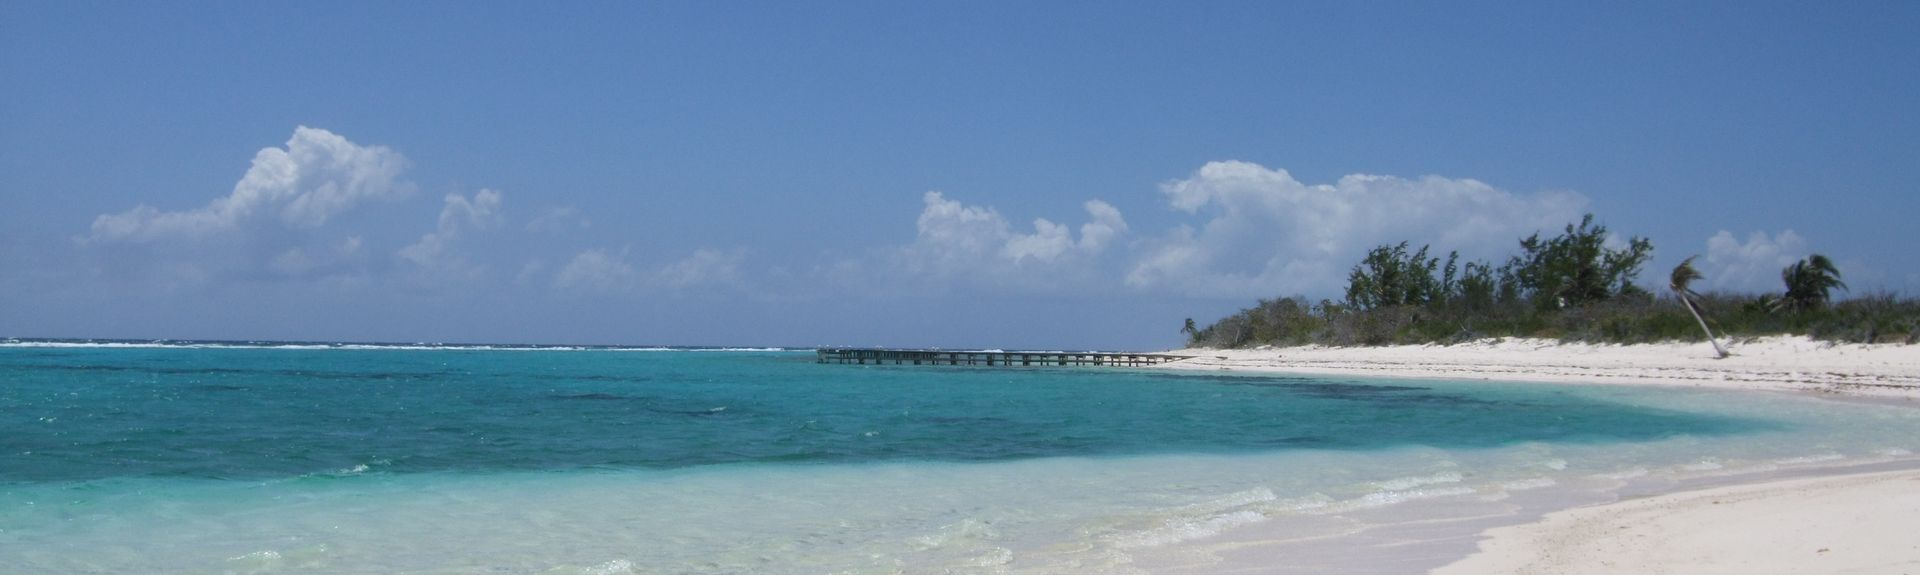 Blossom Village, Cayman Islands